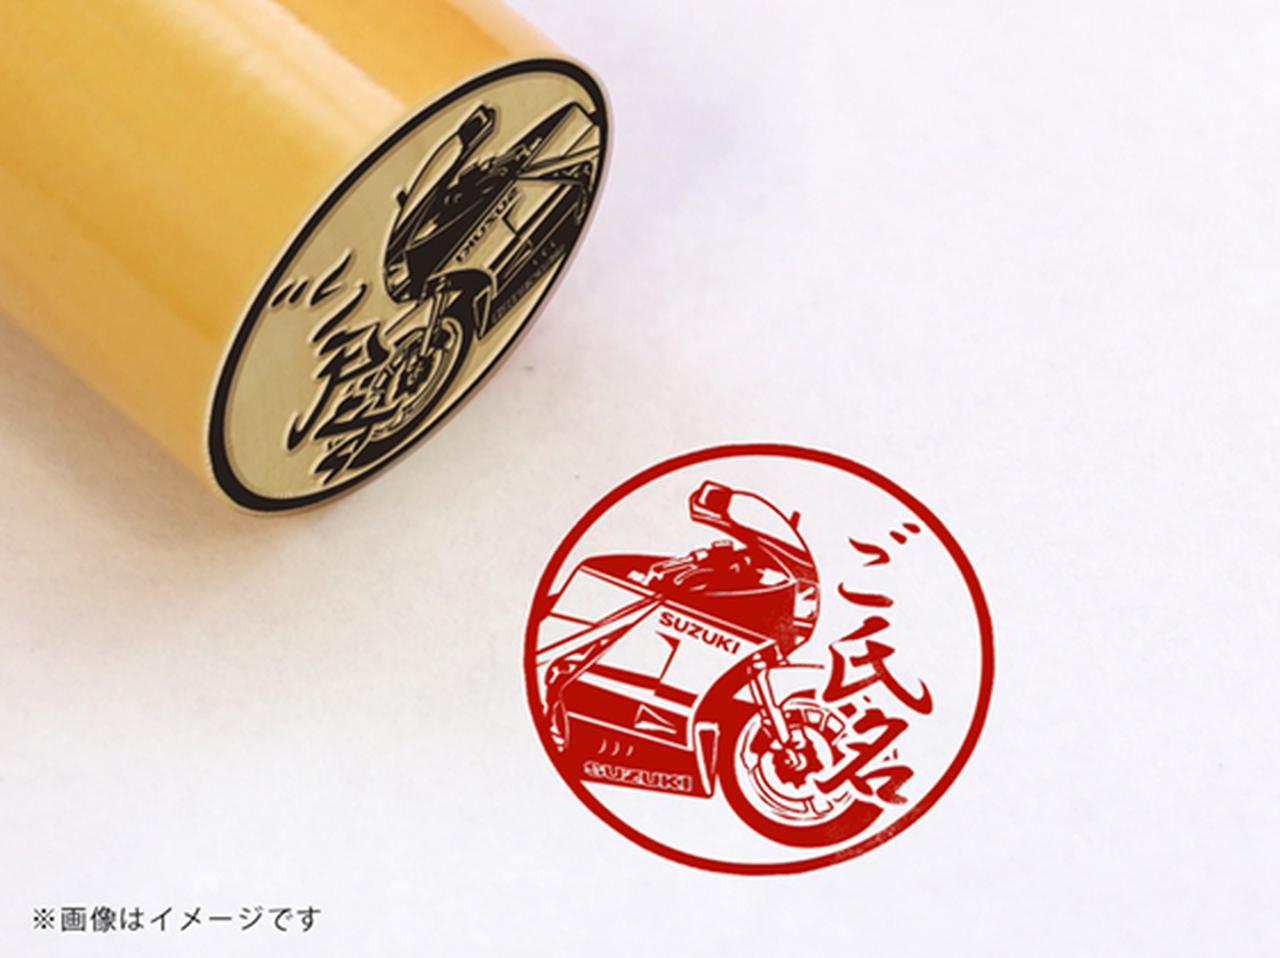 Images : 【SUZUKI】RG500Γ・柘植丸印18mm